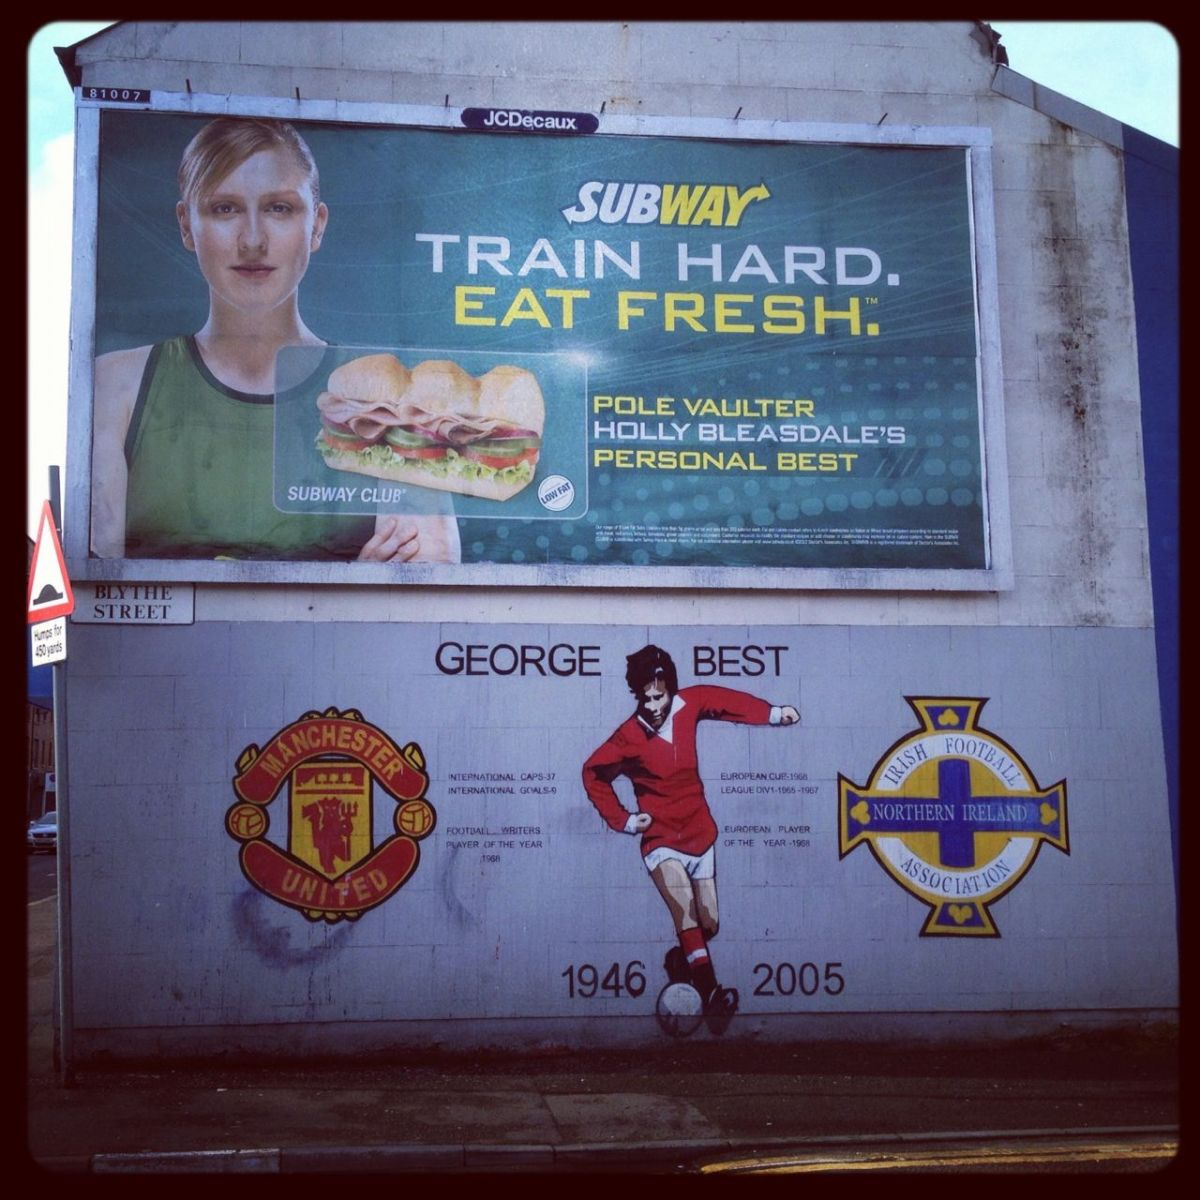 20120518 Train hard eat fresh